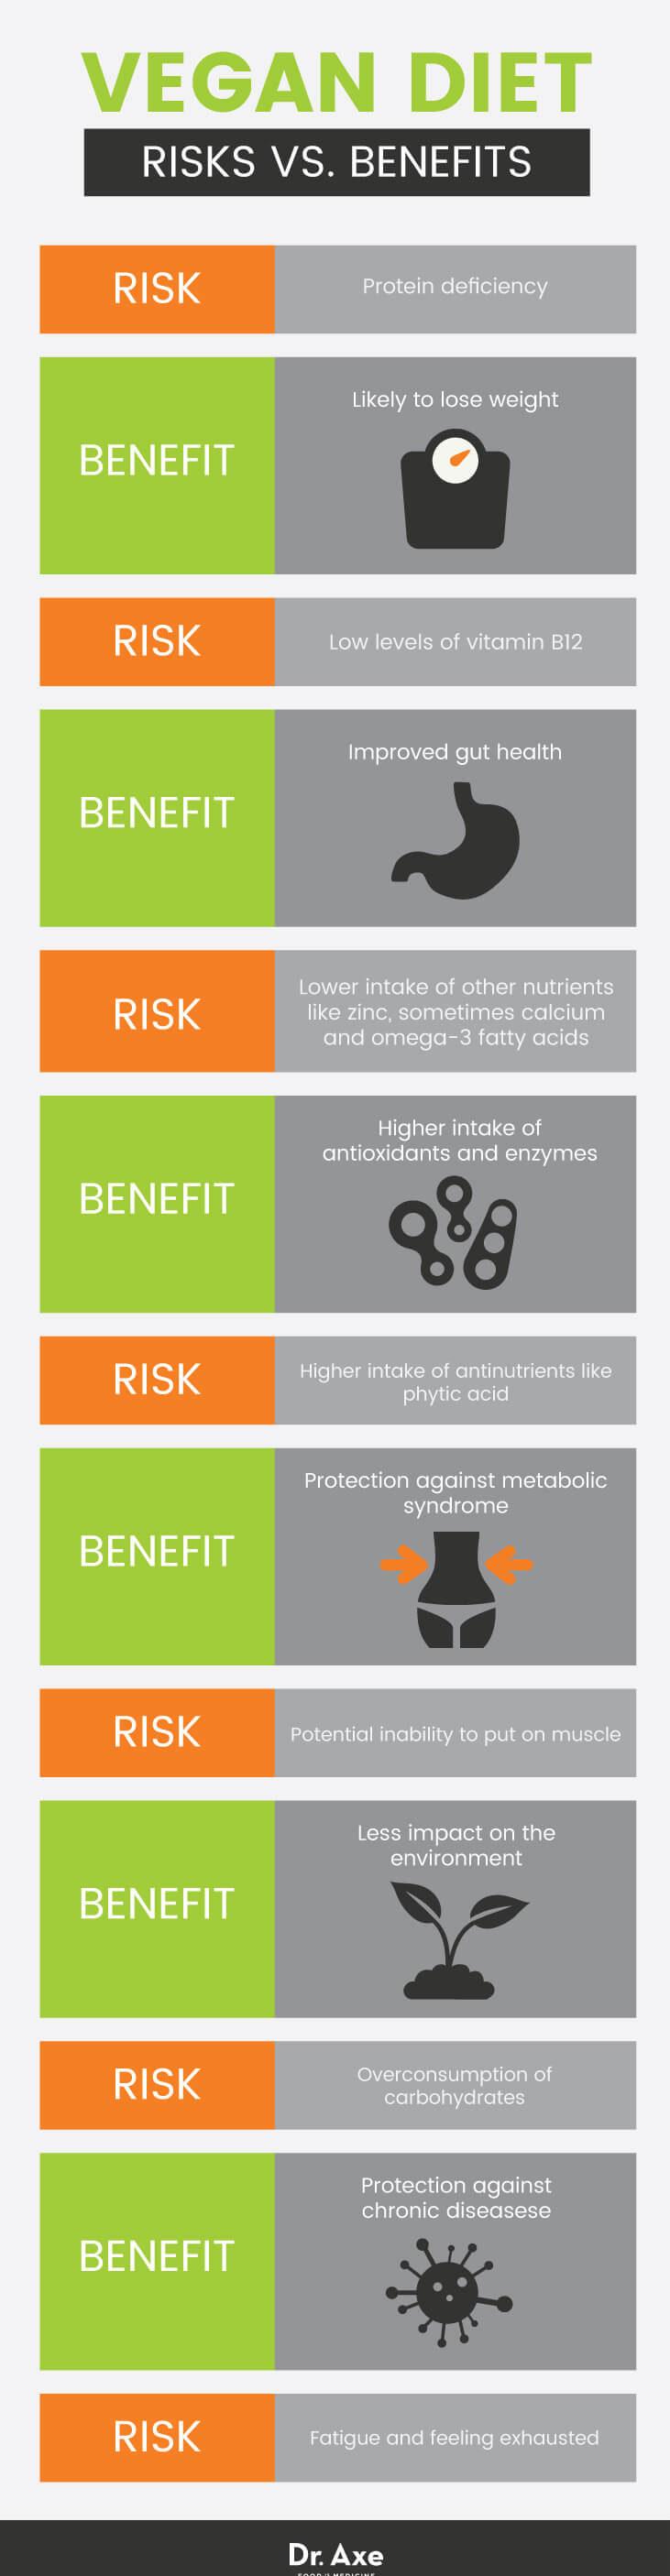 Vegan diet risks vs. benefits - Dr. Axe